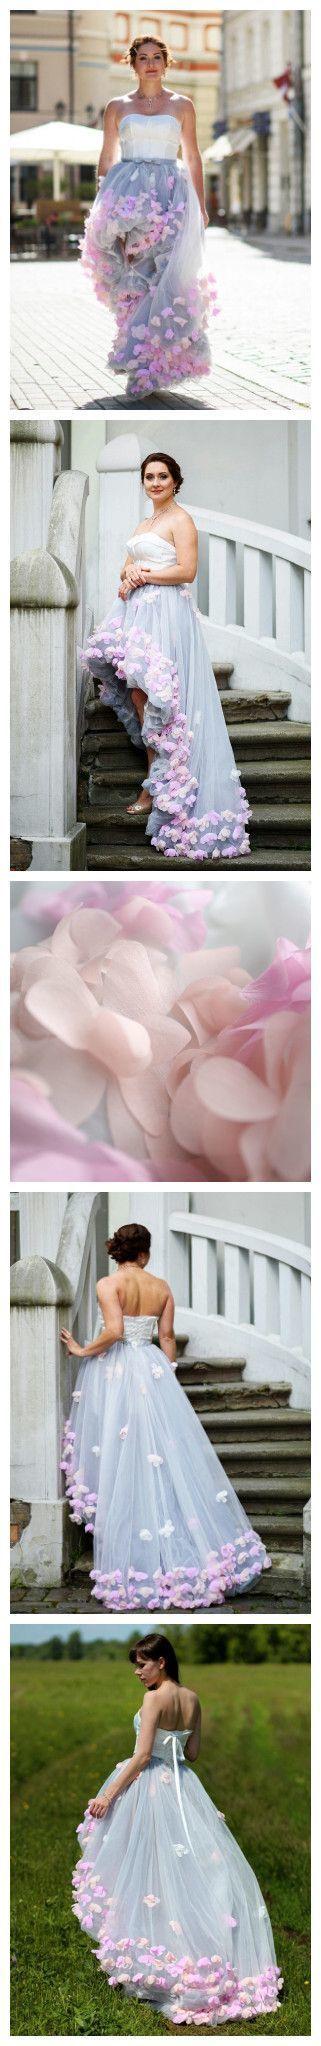 Beading Tulle Prom Dress,High Low Prom Dresses,Prom Dresses,Evening Dress,